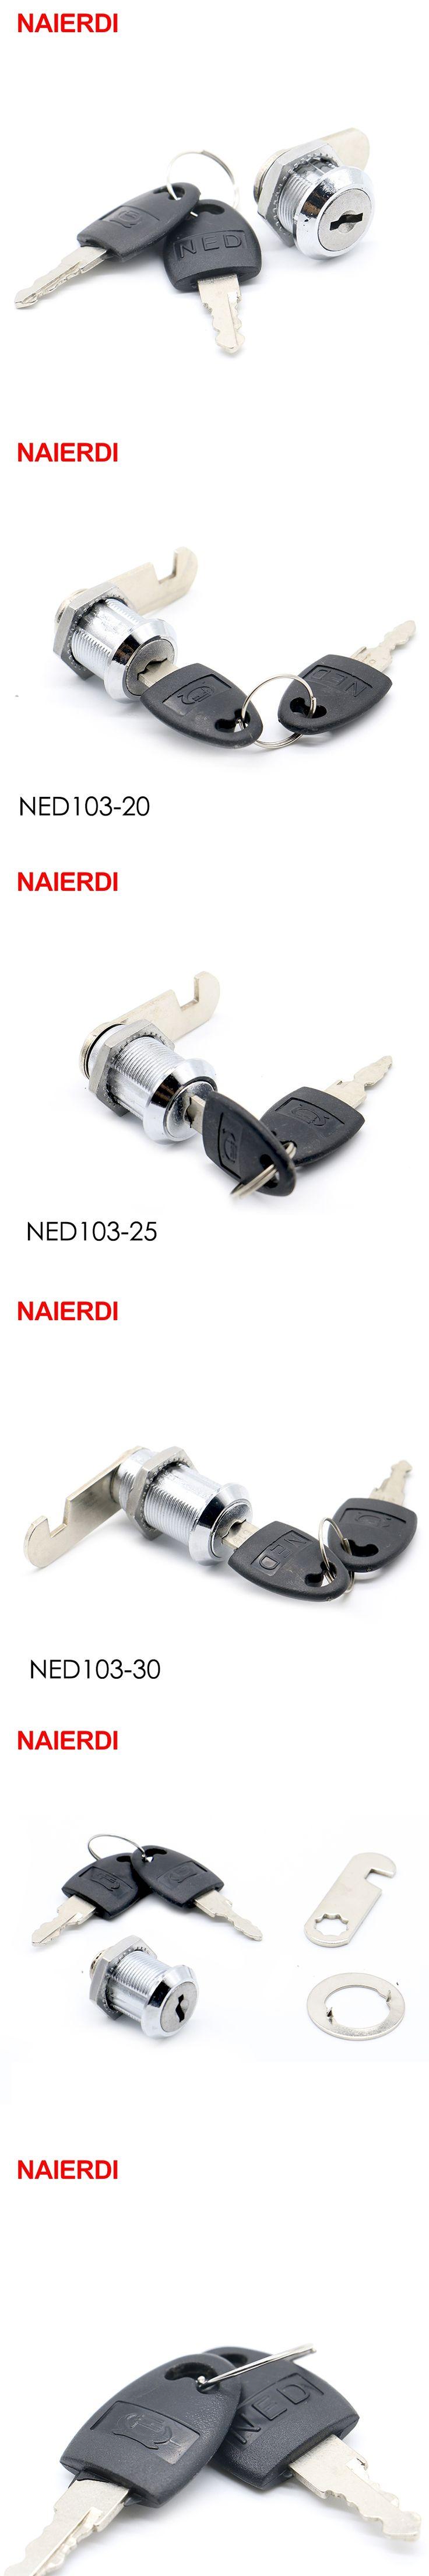 NAIERDI 103 Series Cam Cylinder Locks Door Cabinet Mailbox Drawer Cupboard Locker Furniture Locks With Plastic Keys Hardware